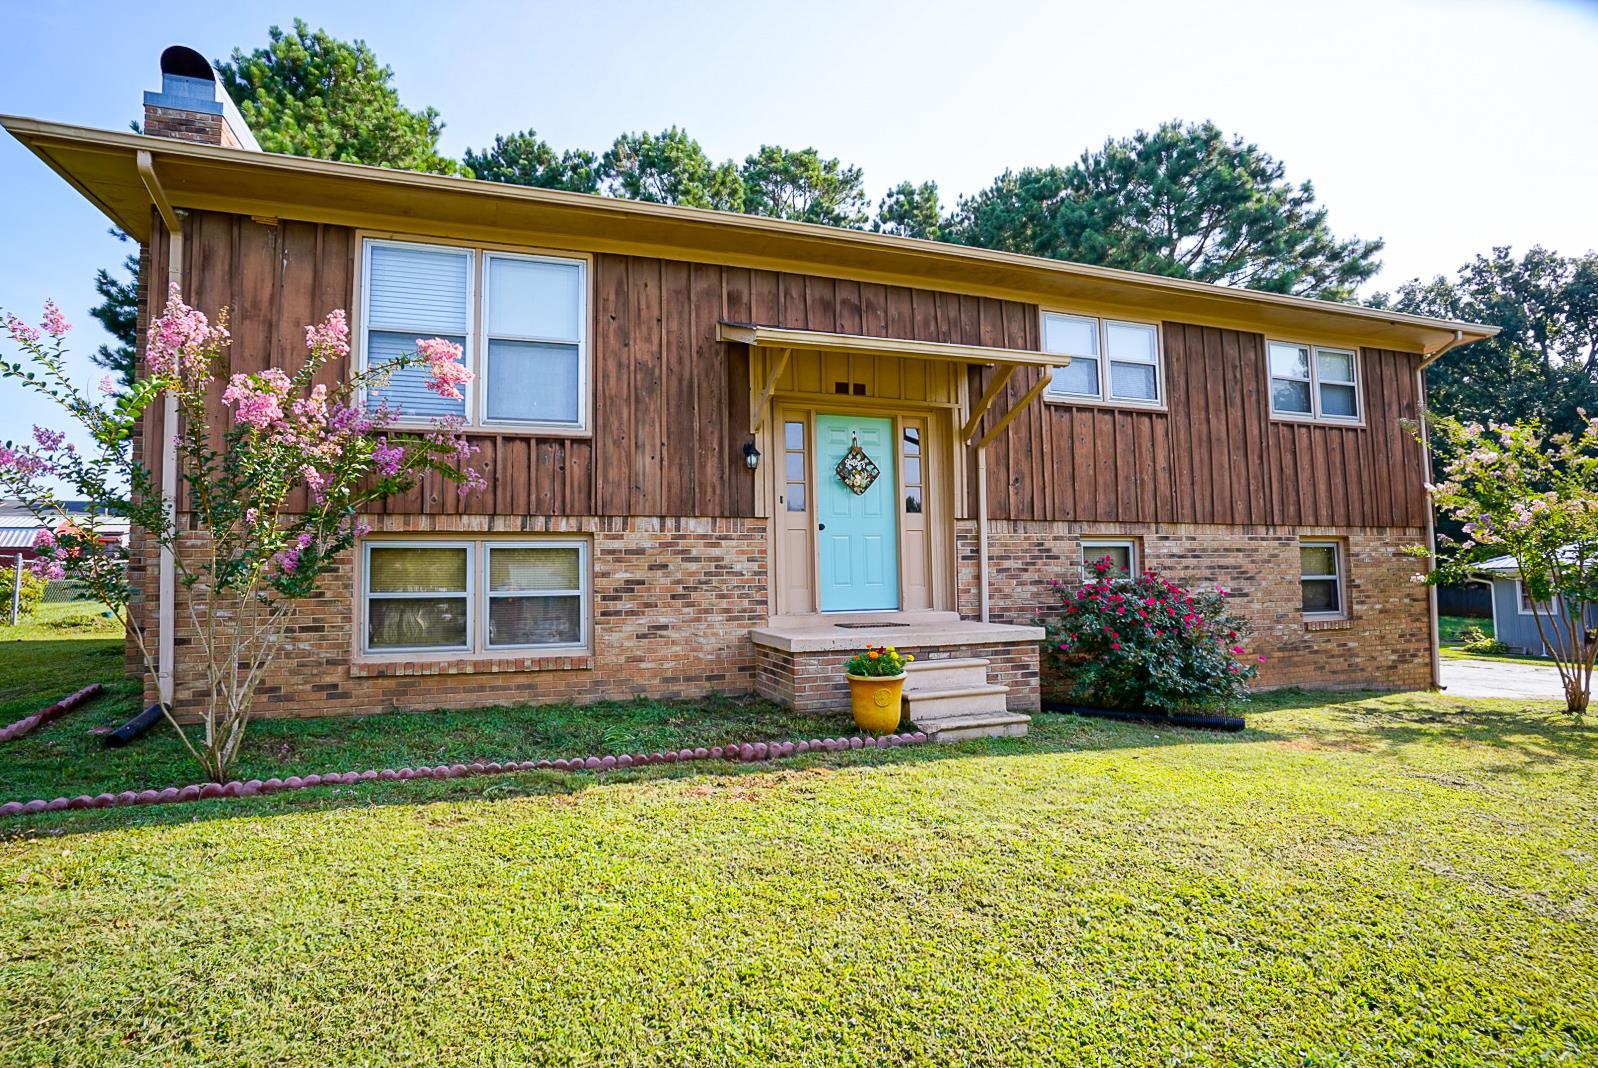 1708 Deer Hollow Dr, Lawrenceburg, TN 38464 - Lawrenceburg, TN real estate listing